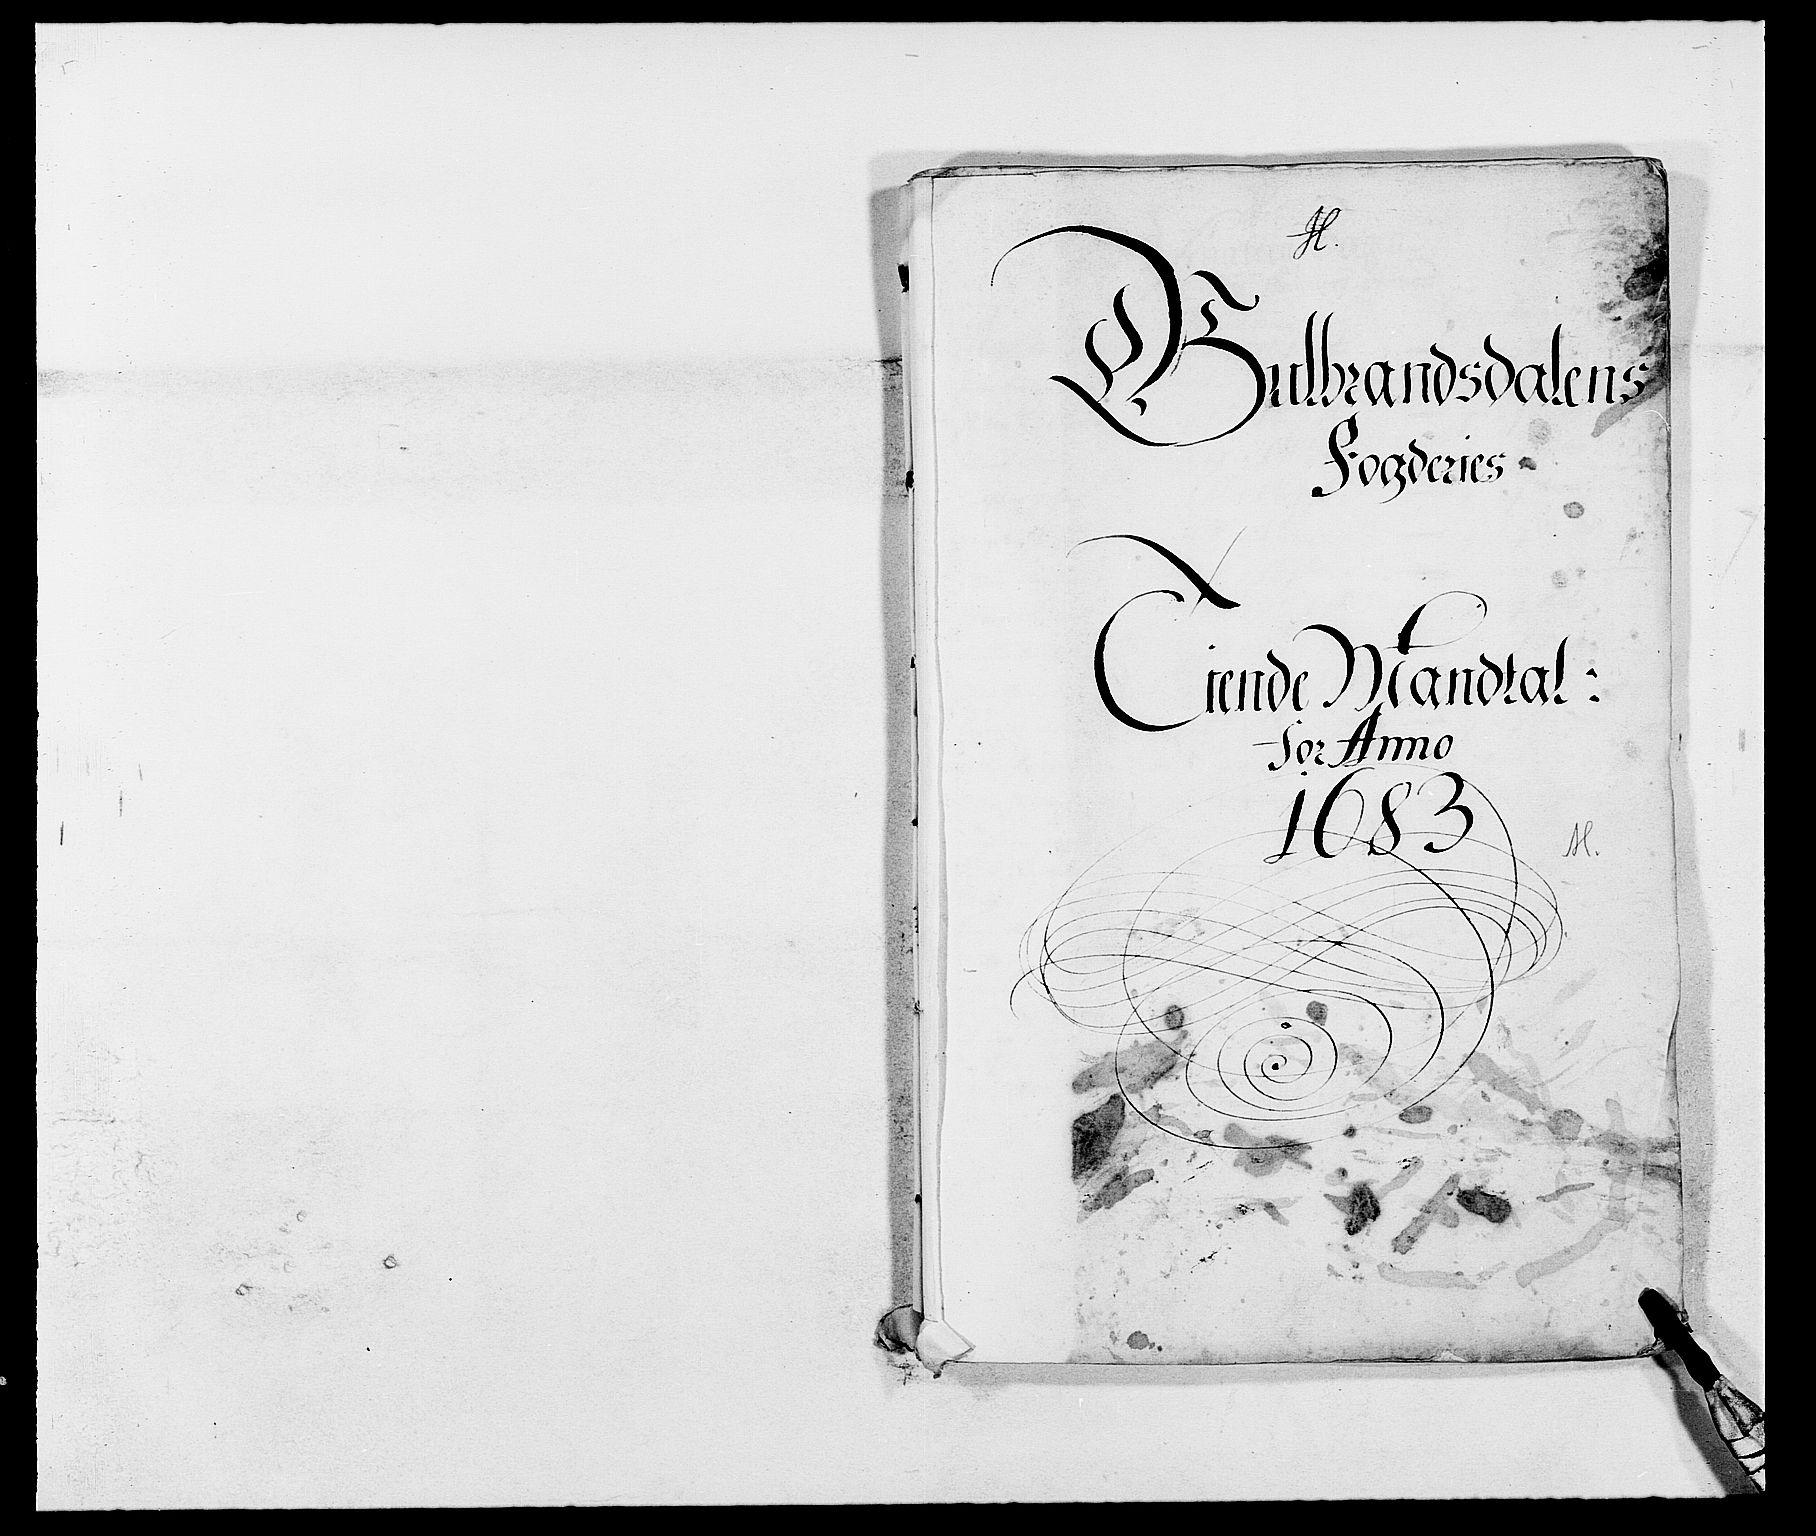 RA, Rentekammeret inntil 1814, Reviderte regnskaper, Fogderegnskap, R17/L1158: Fogderegnskap Gudbrandsdal, 1682-1689, s. 18